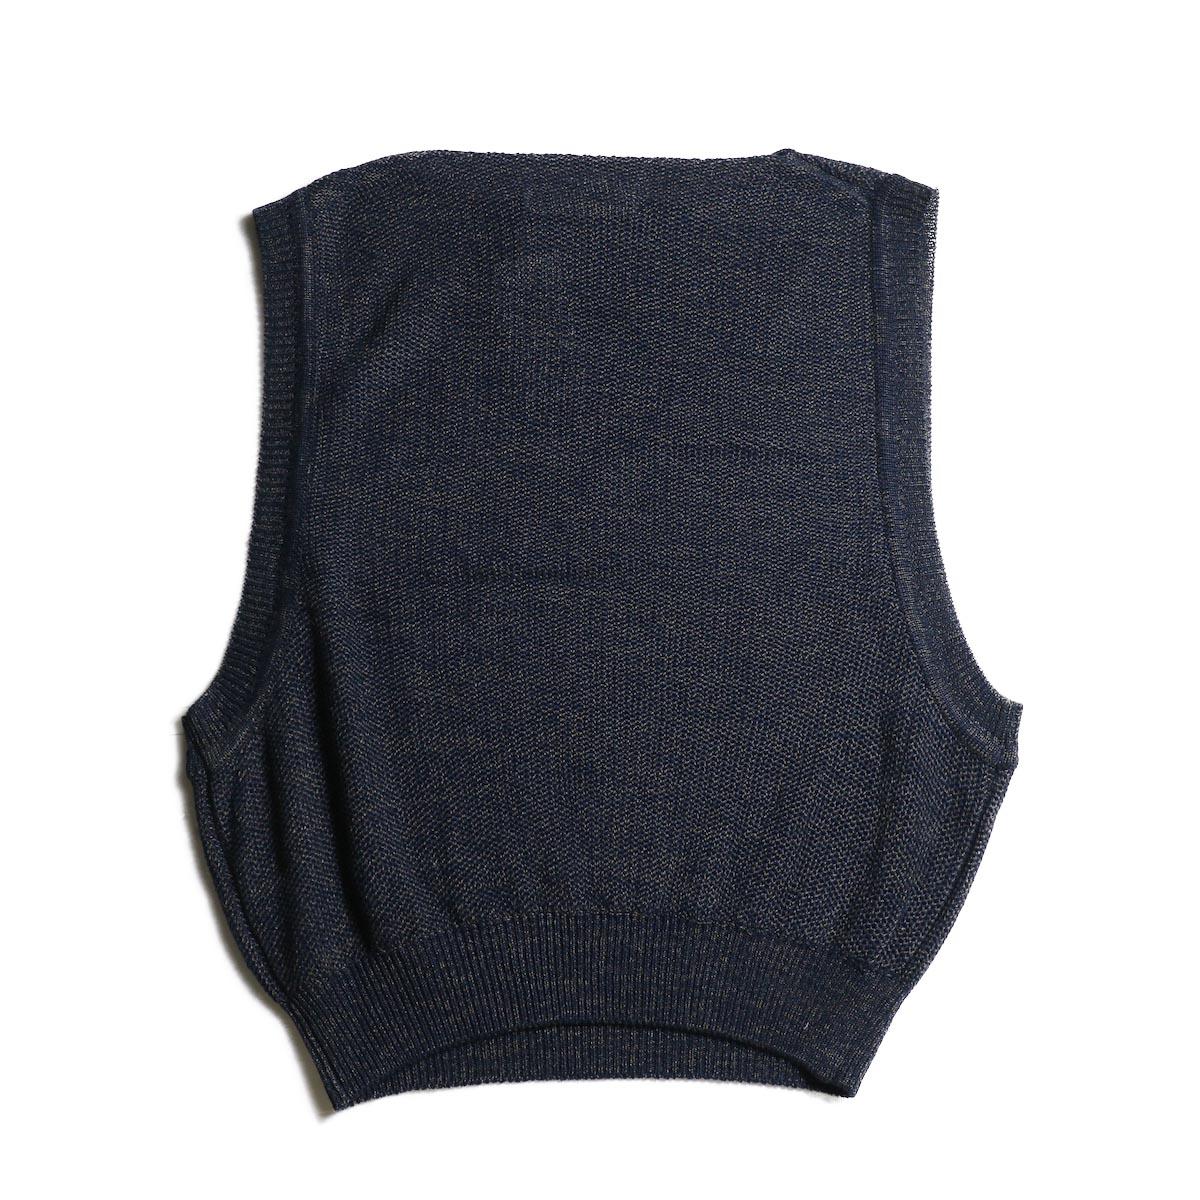 JANE SMITH / Over Vest (Navy Mix)背面